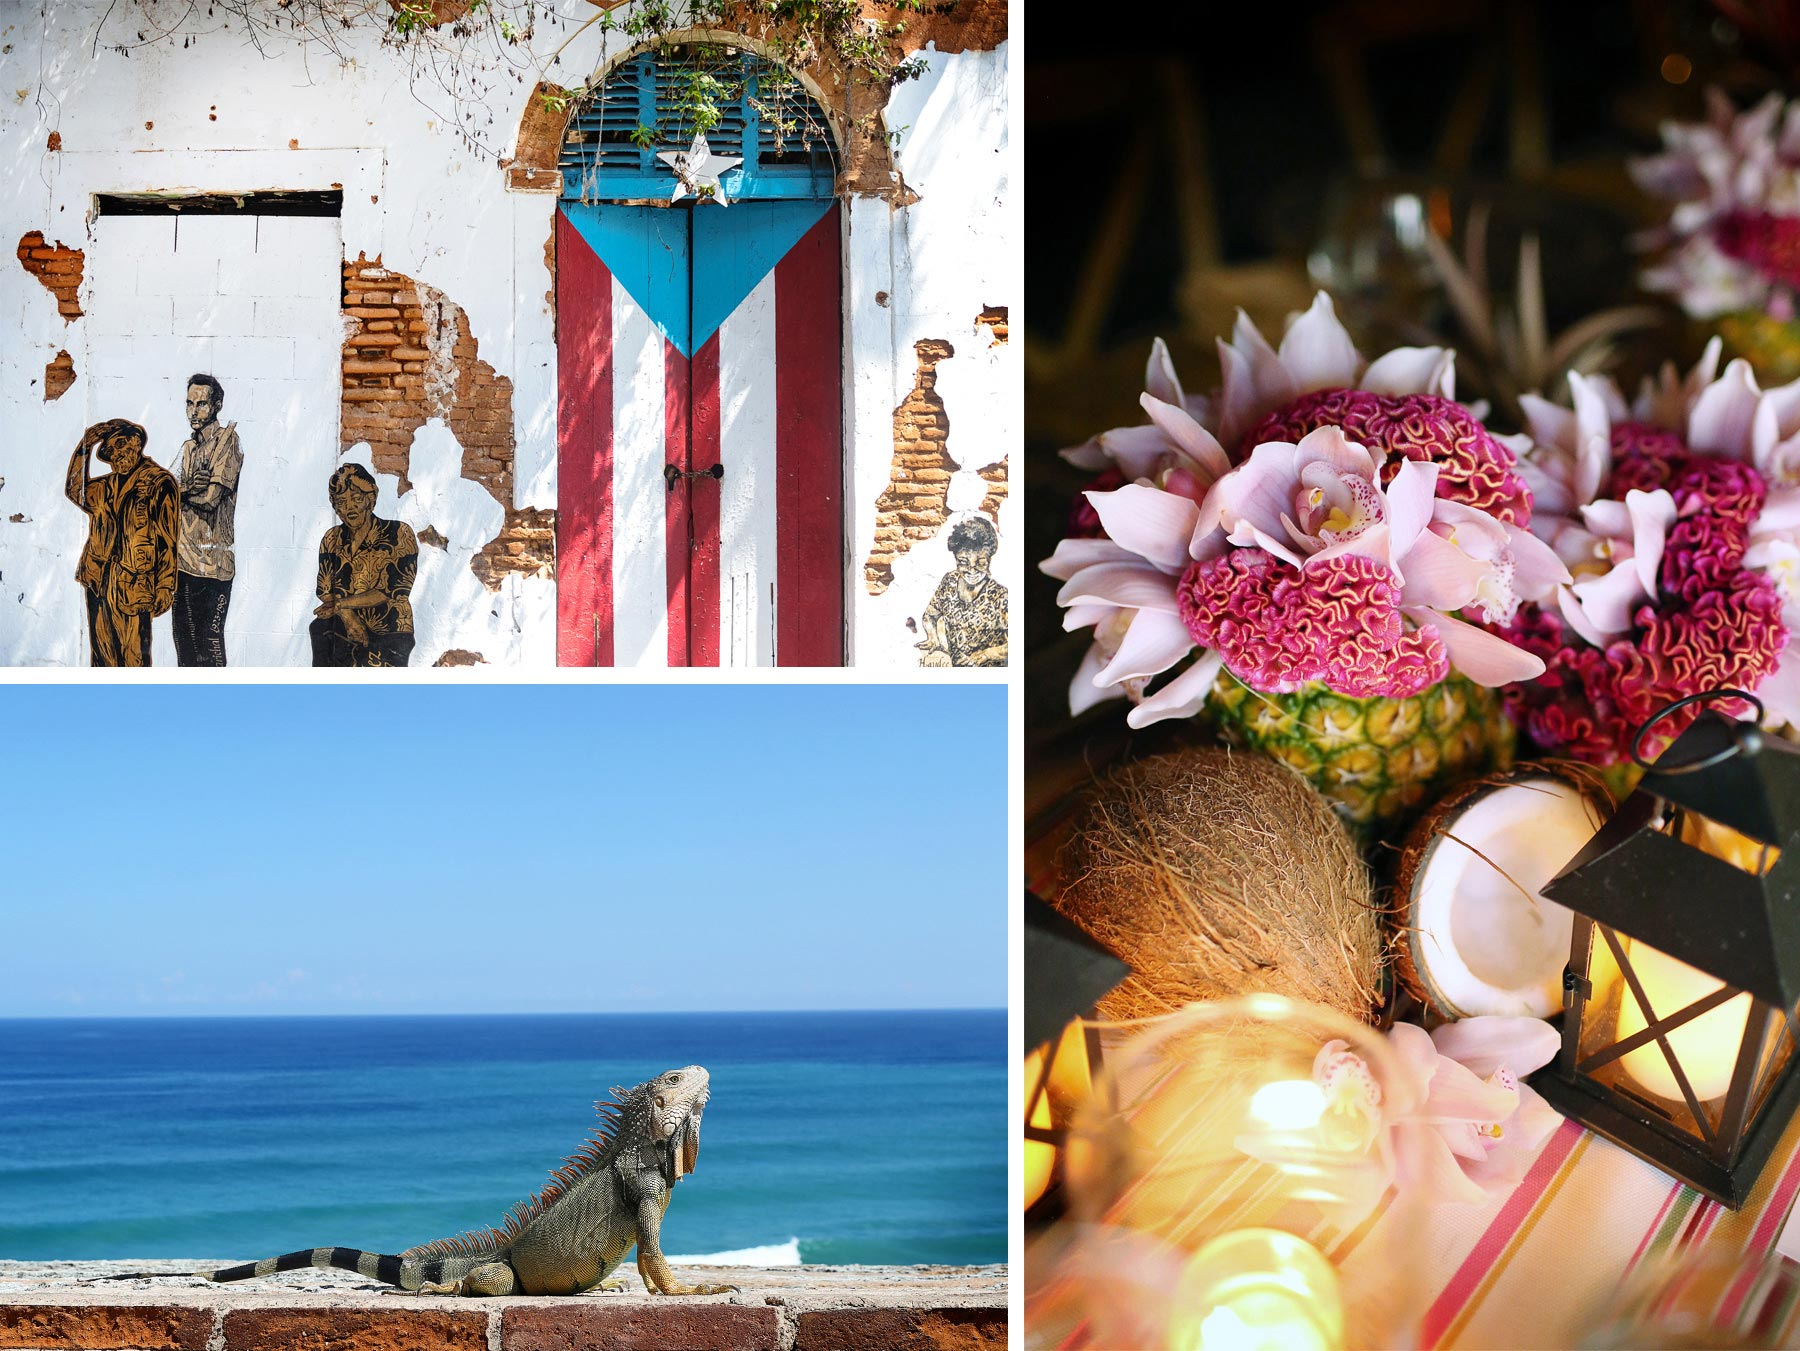 02-Puerto-Rico-Wedding-Photography-by-Vick-Photography-Destination-Wedding-Island-Tropical-Paradise-Chanel-and-Sam.jpg